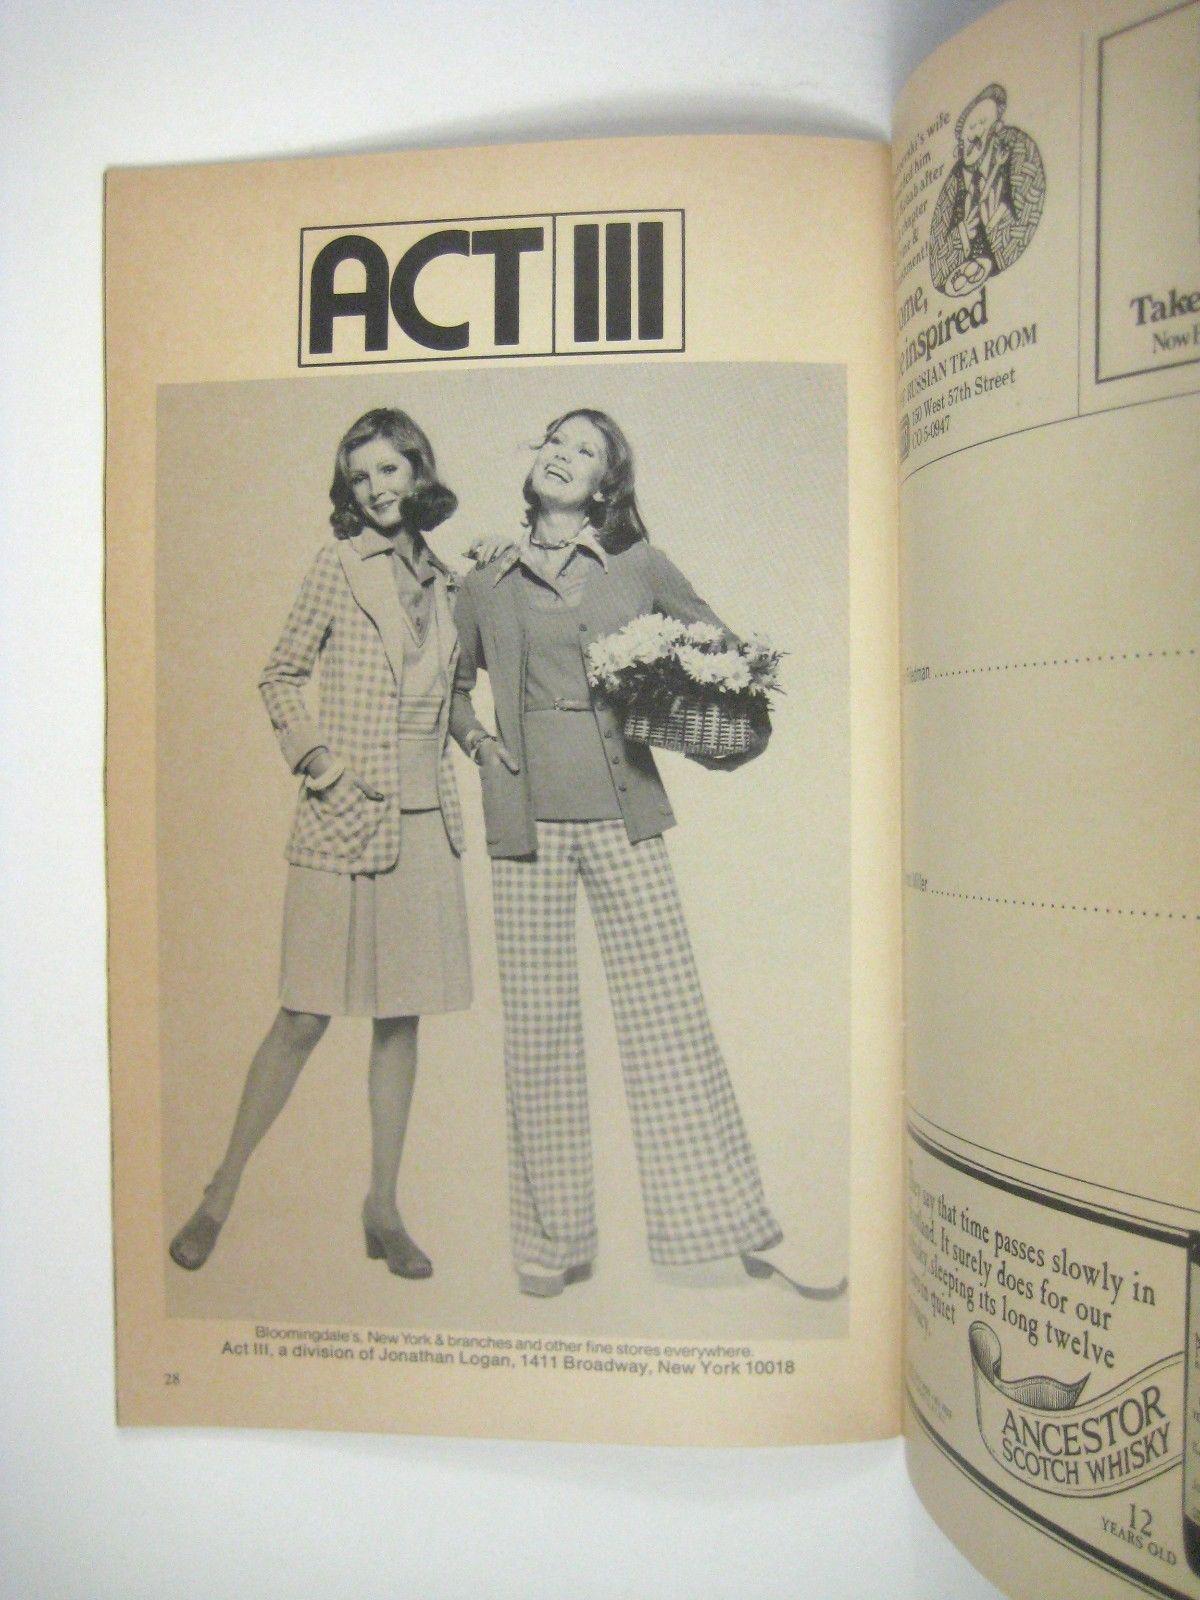 6 Rms Riv VuPlaybill 1973 Lunt Fontaine Theatre Jerry Orbach Alexander Randall